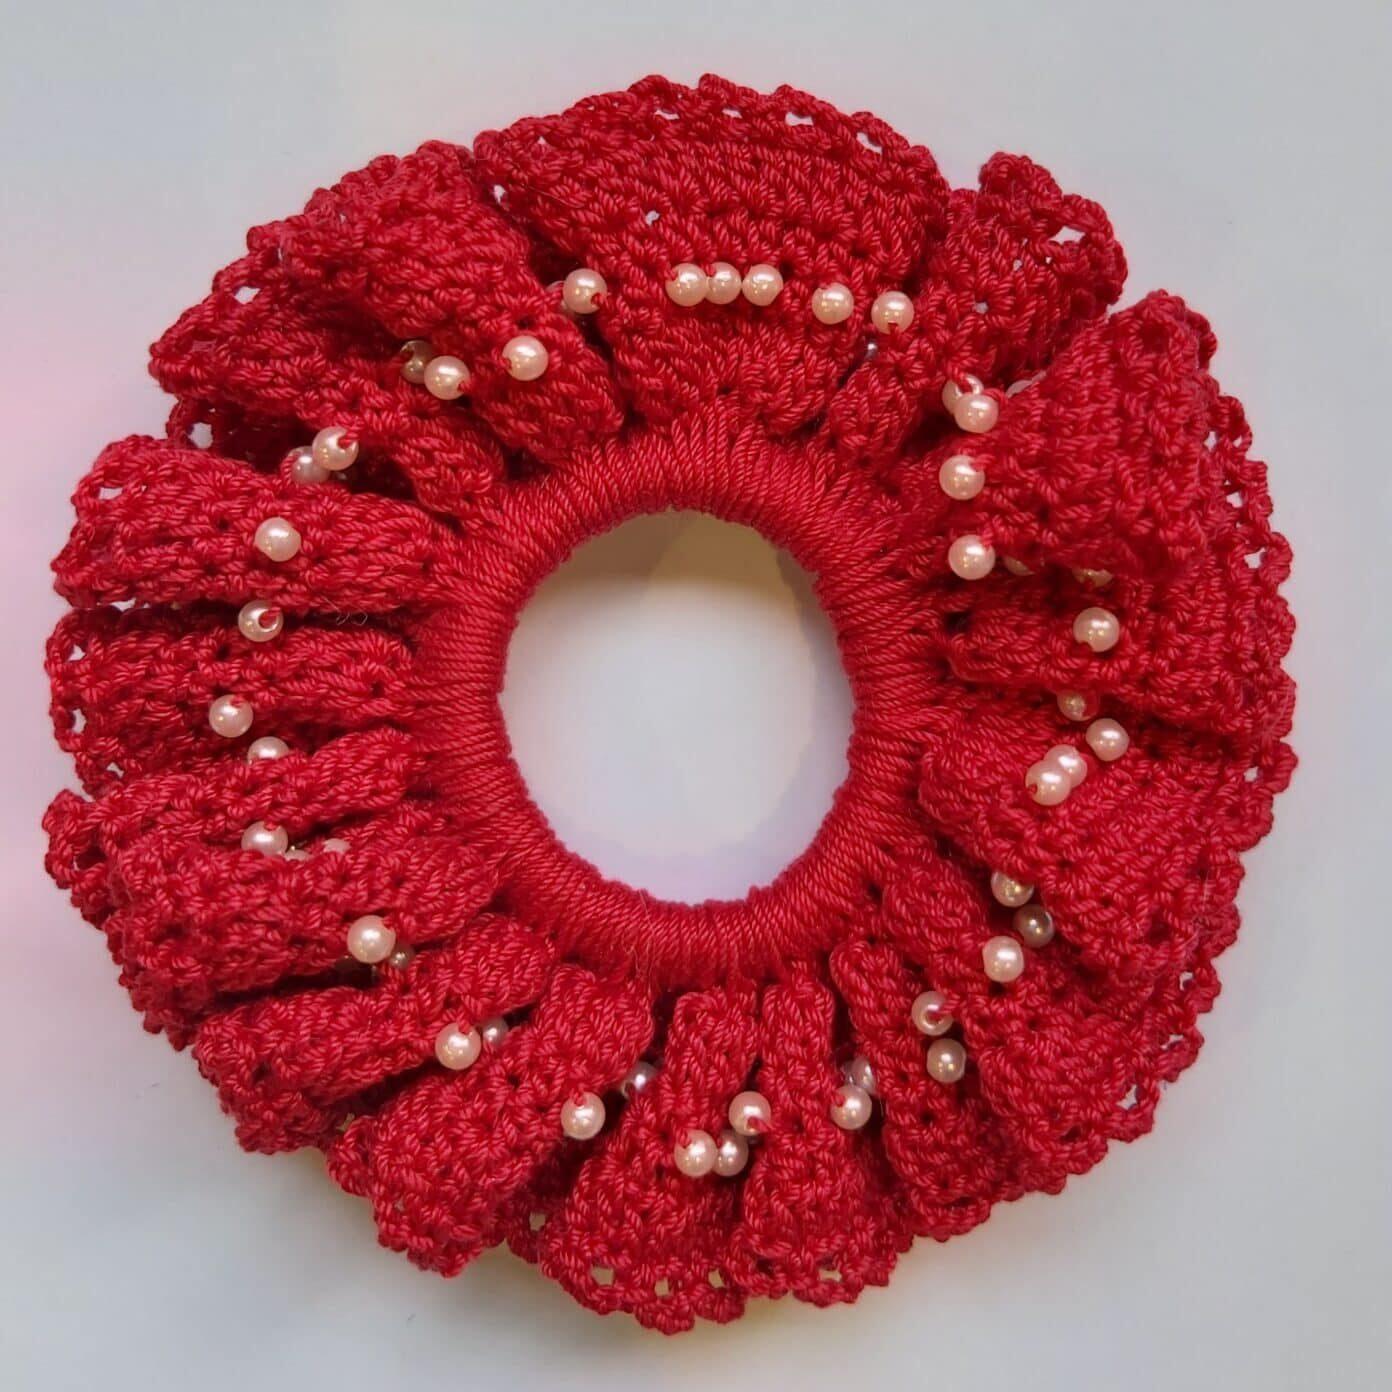 Red Scrunchie Handmade By U-Knit Crochet